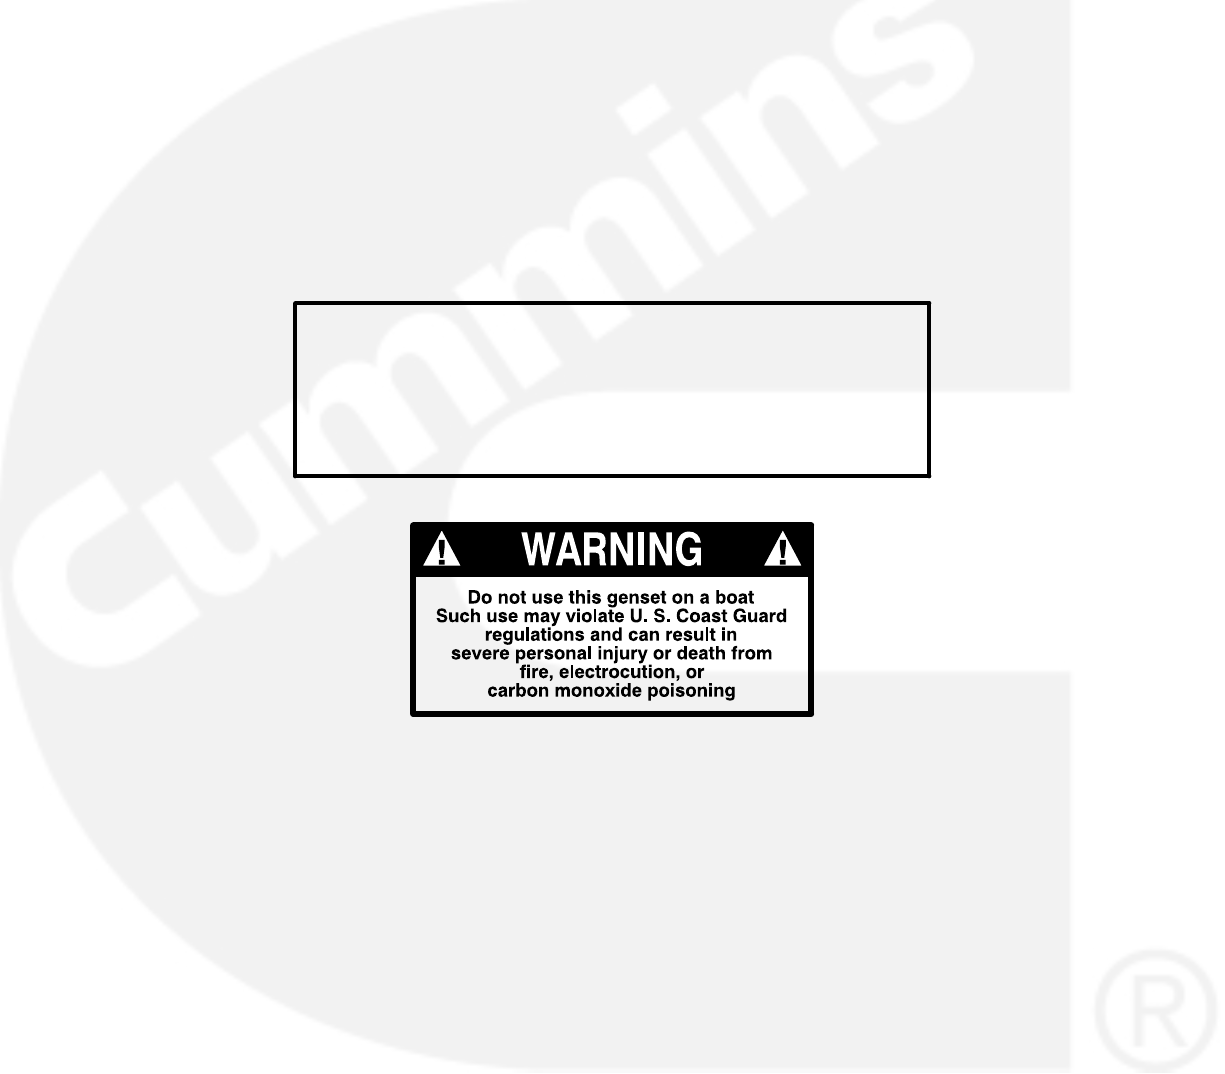 981 0522 I9 201006 Onan Hdka Spec A M Diesel Rv Genset Inverter Charger Wiring Diagram California